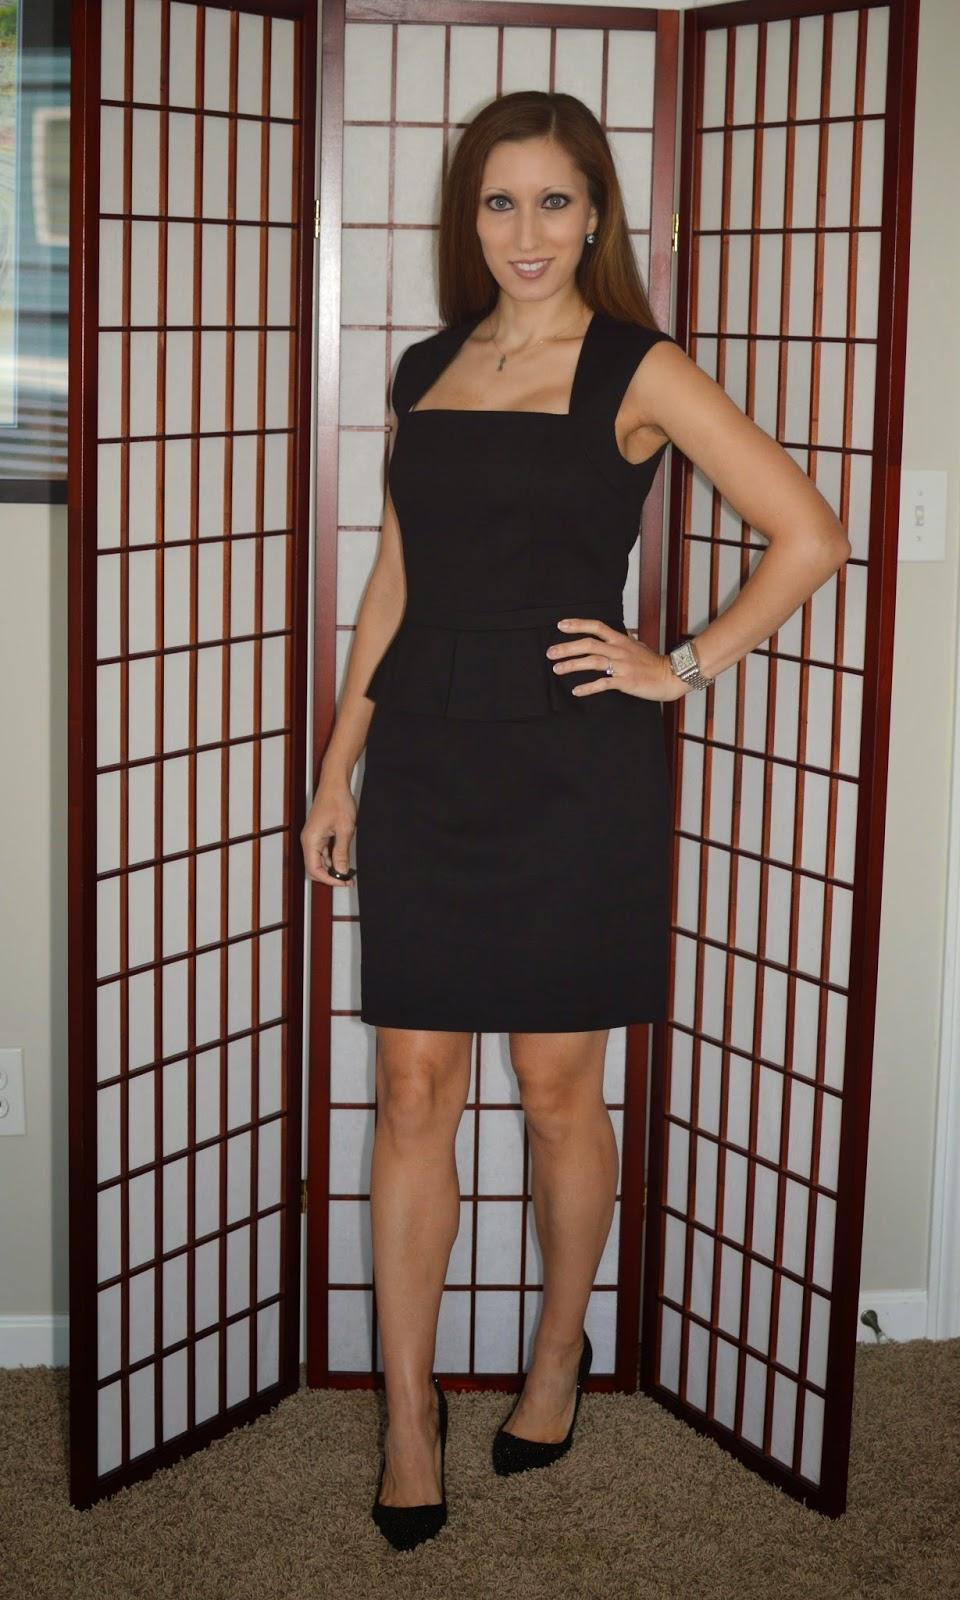 df0d6b0d045 Everyday Fashionista - Atlanta Blogger: October 2014